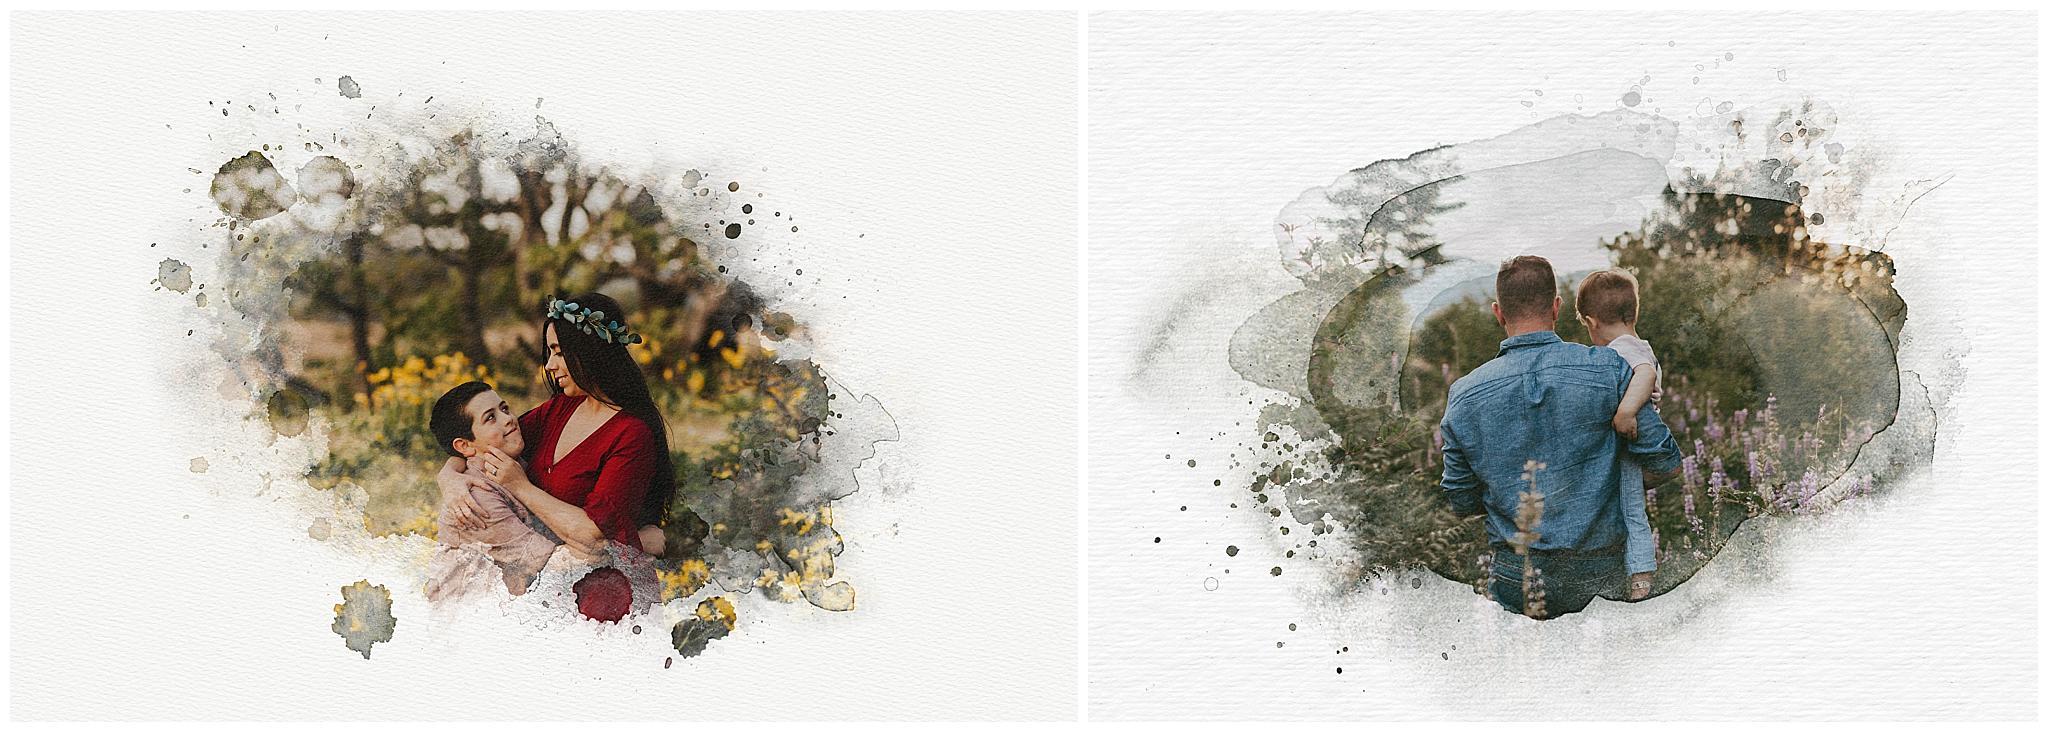 watercolor photoshop images - portland oregon